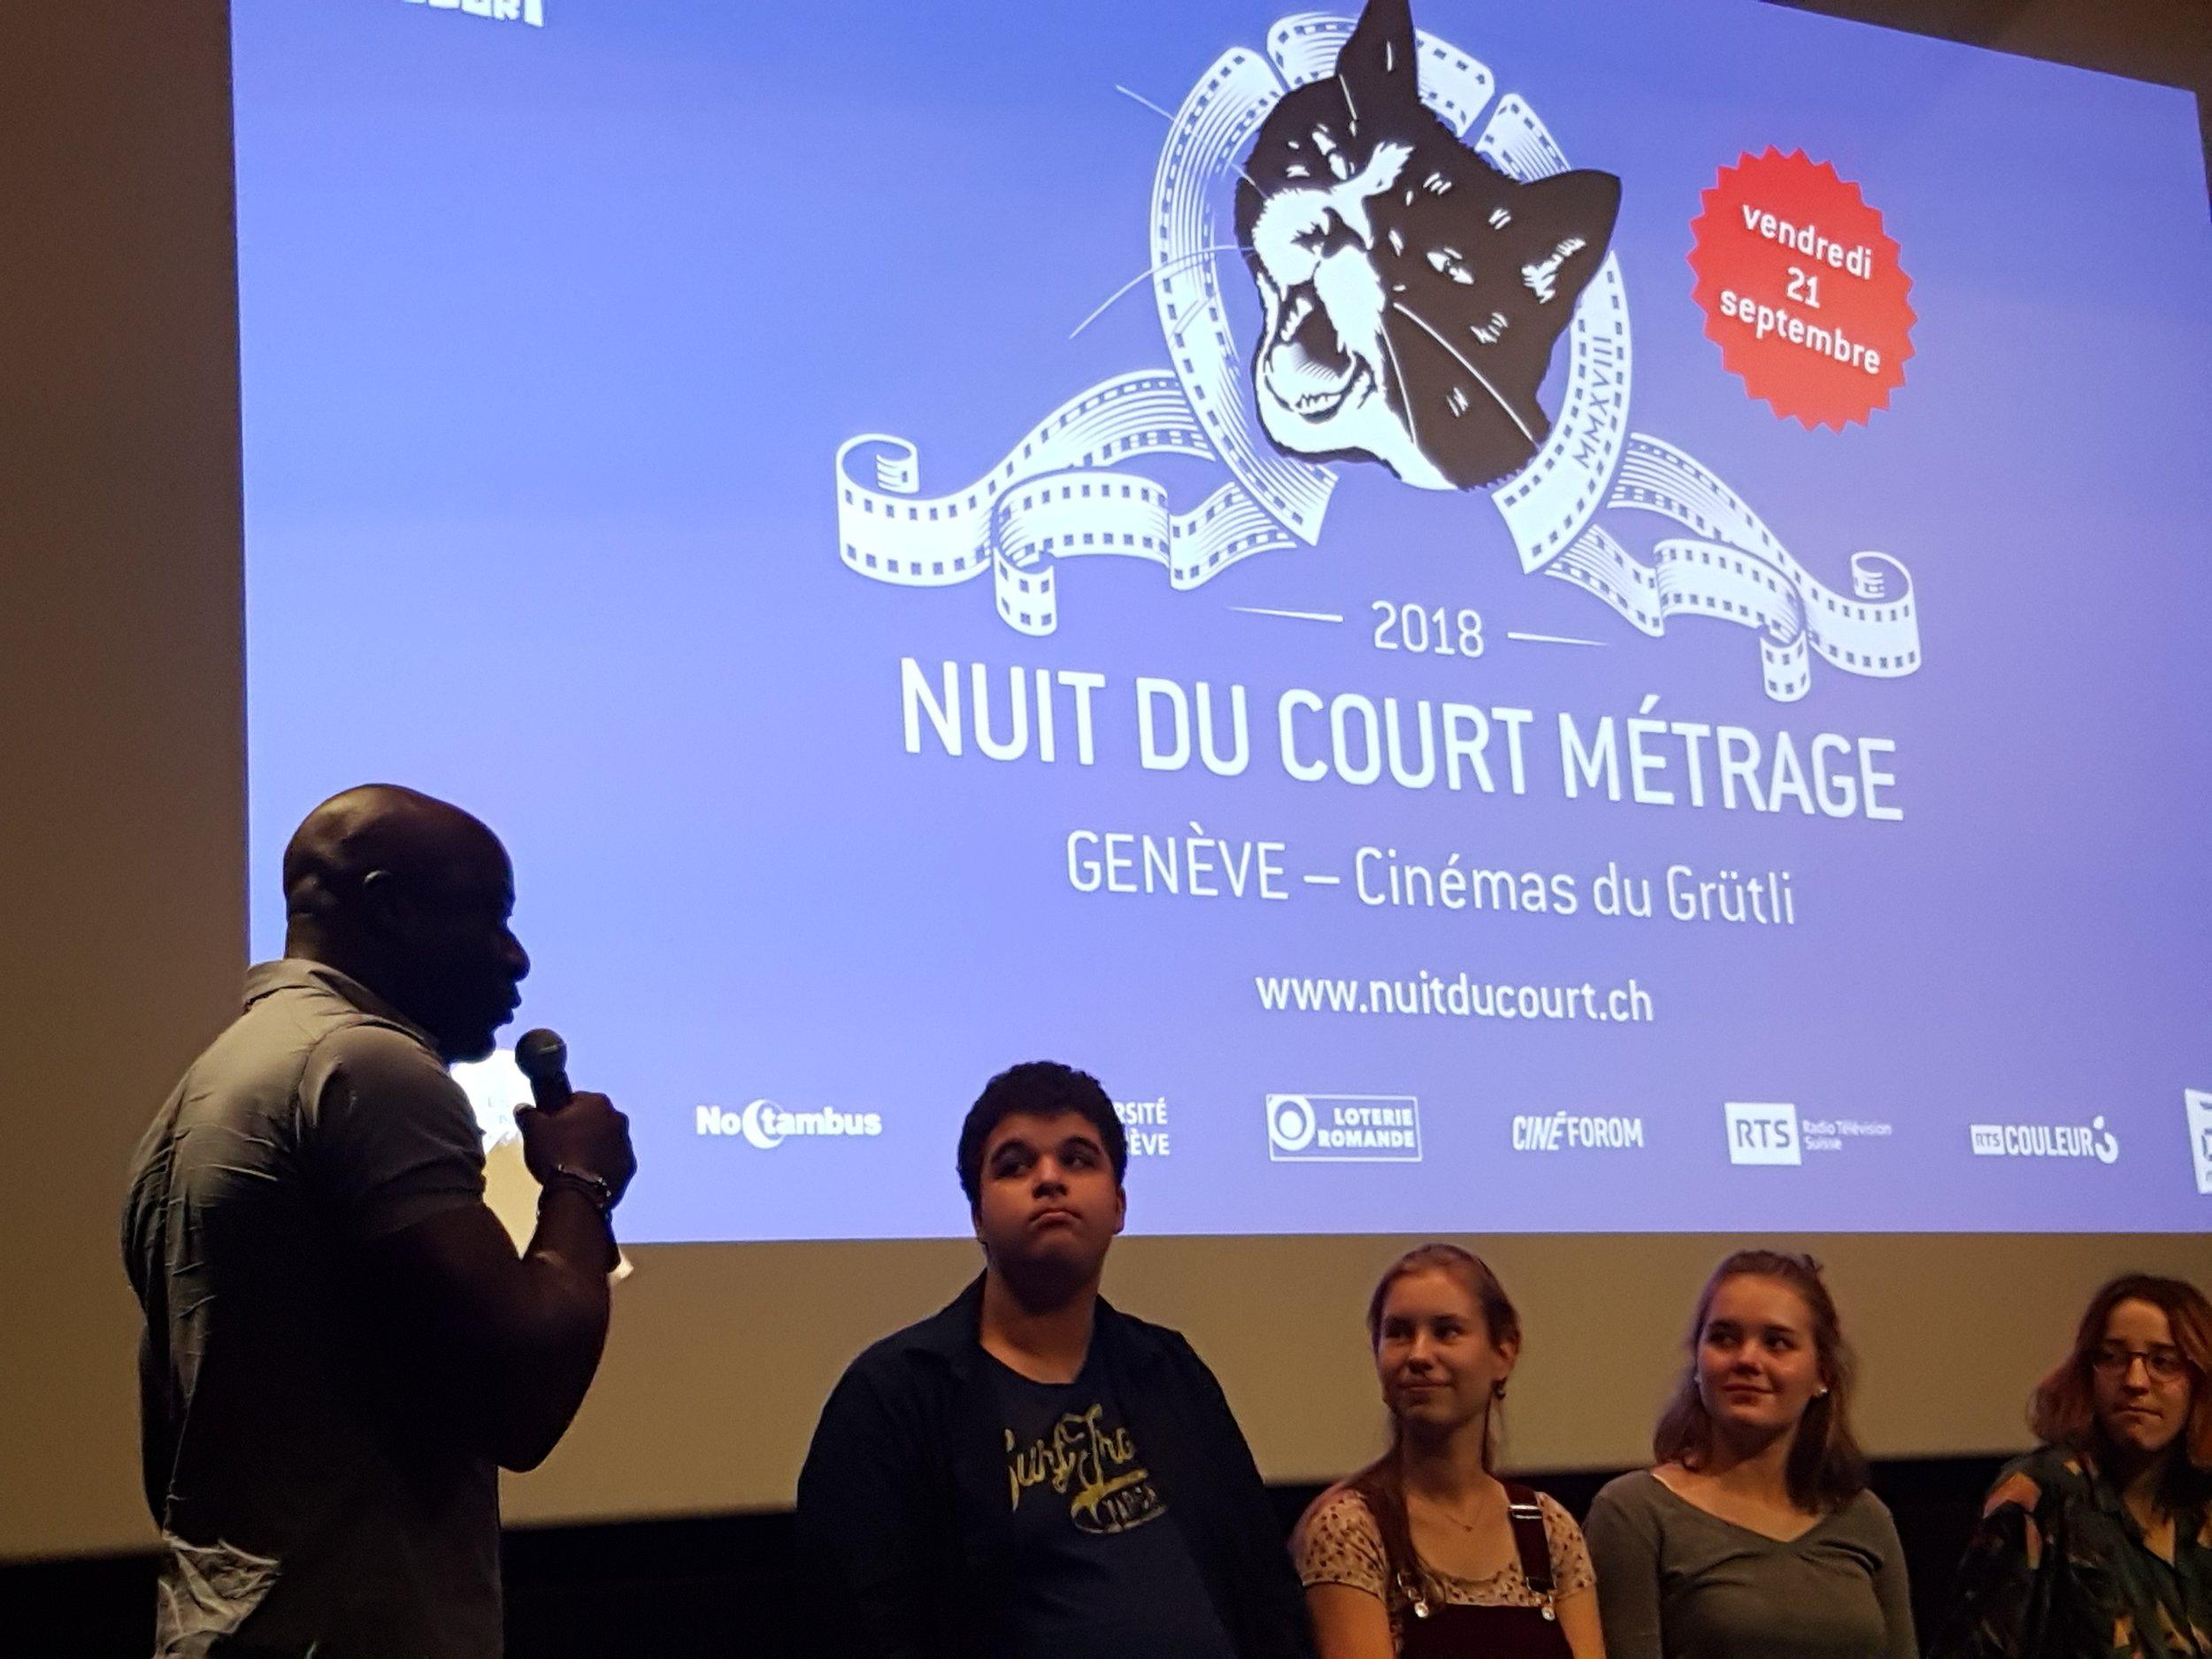 NDC18_2018-09-21_Geneve_Jury-des-jeunes_13.jpg